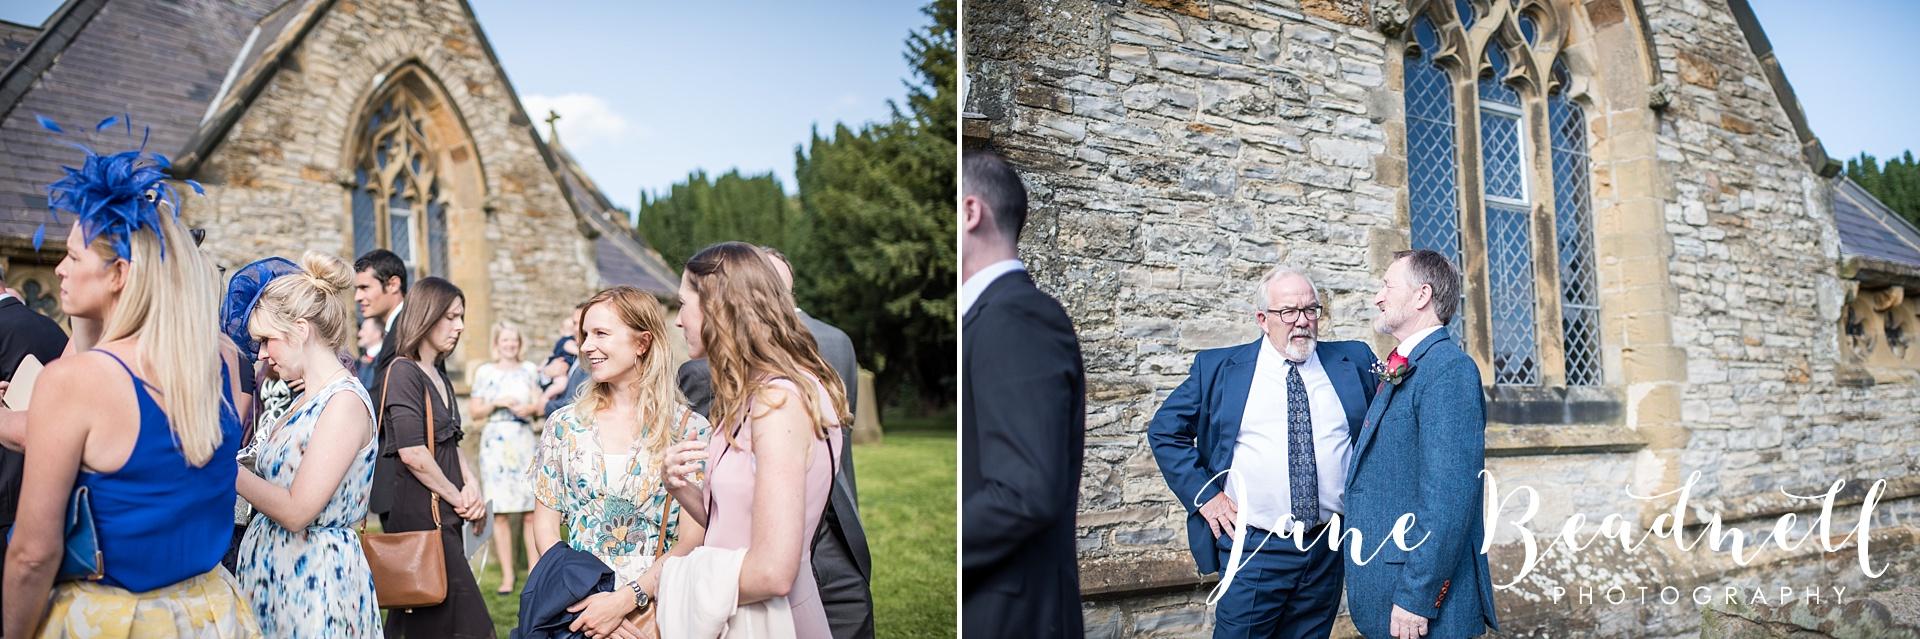 fine-art-wedding-photographer-jane-beadnell-yorkshire-wedding-photographer_0059